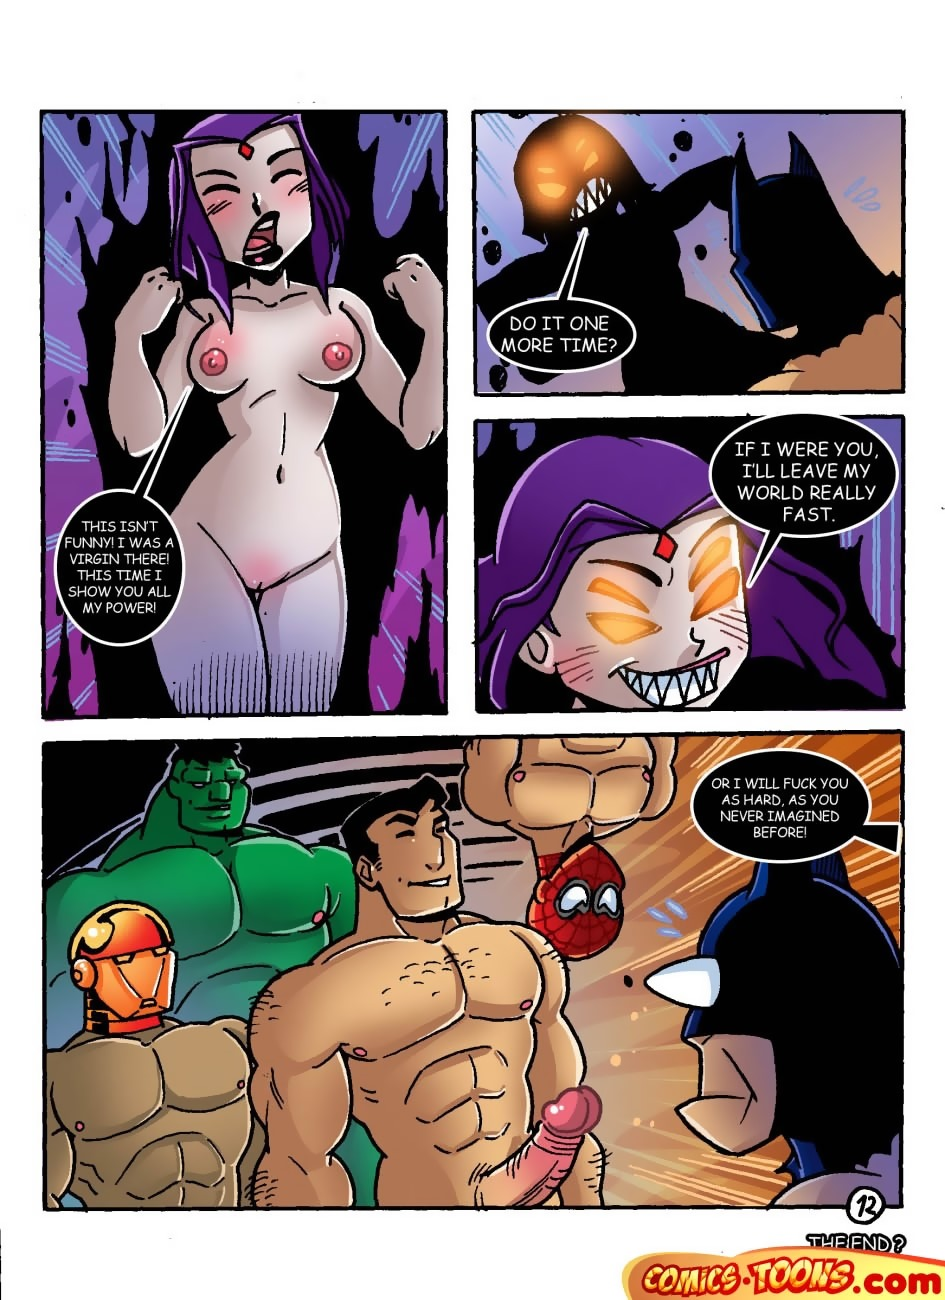 Ravens Dream (Teen Titans, Batman)